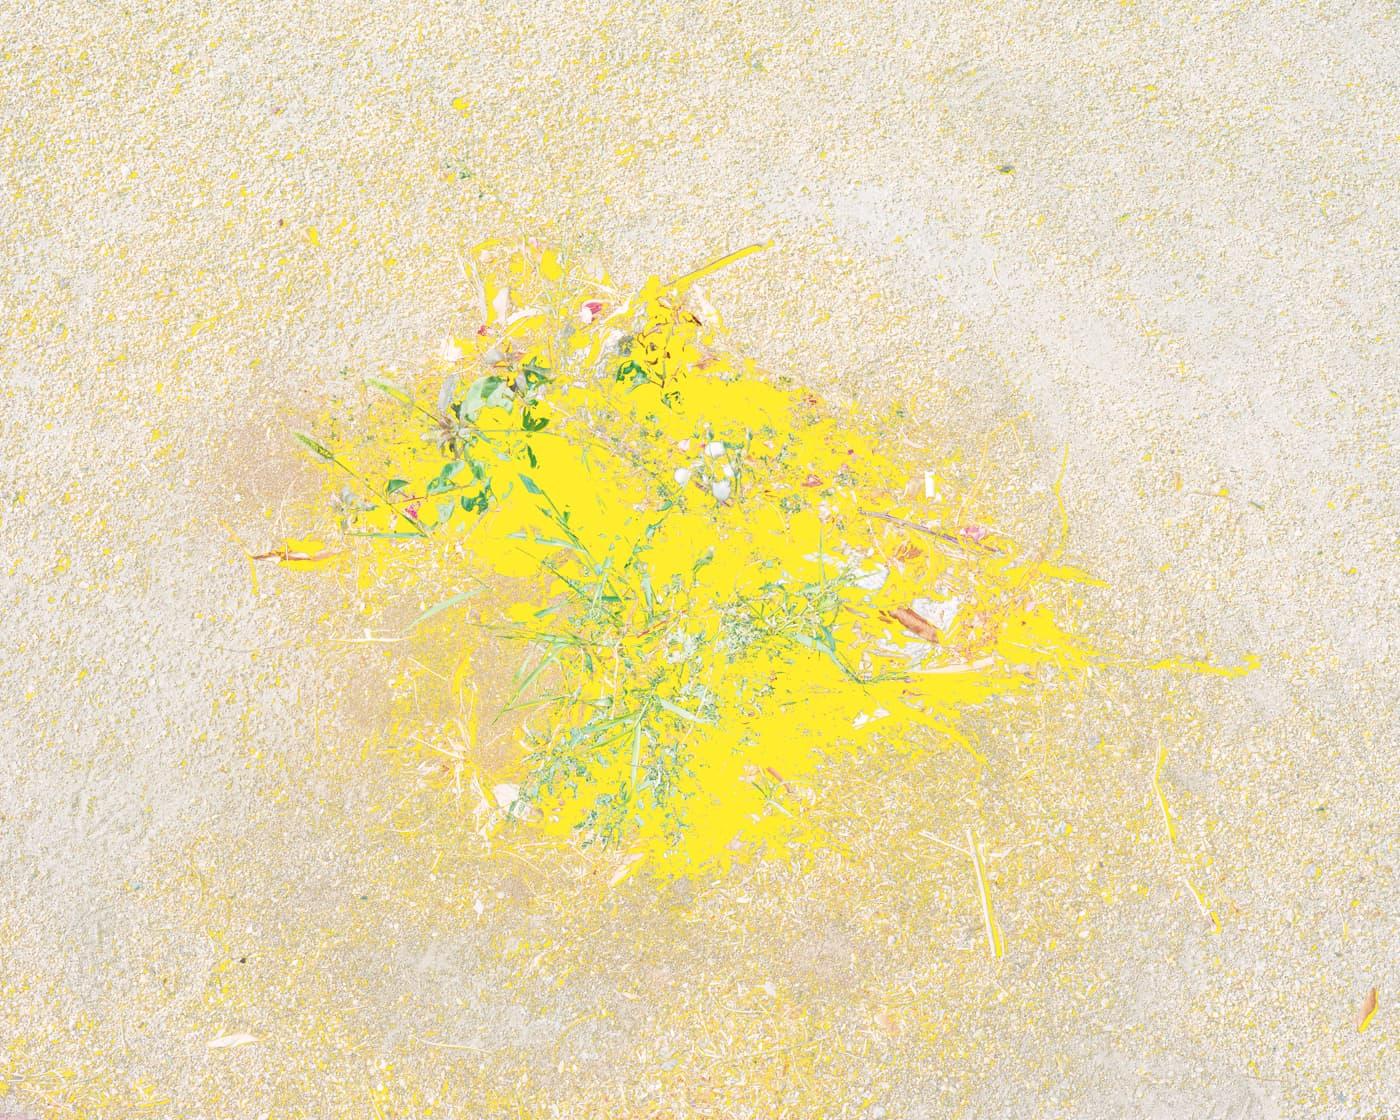 007-aaron-rothman%E2%80%93signal-noise